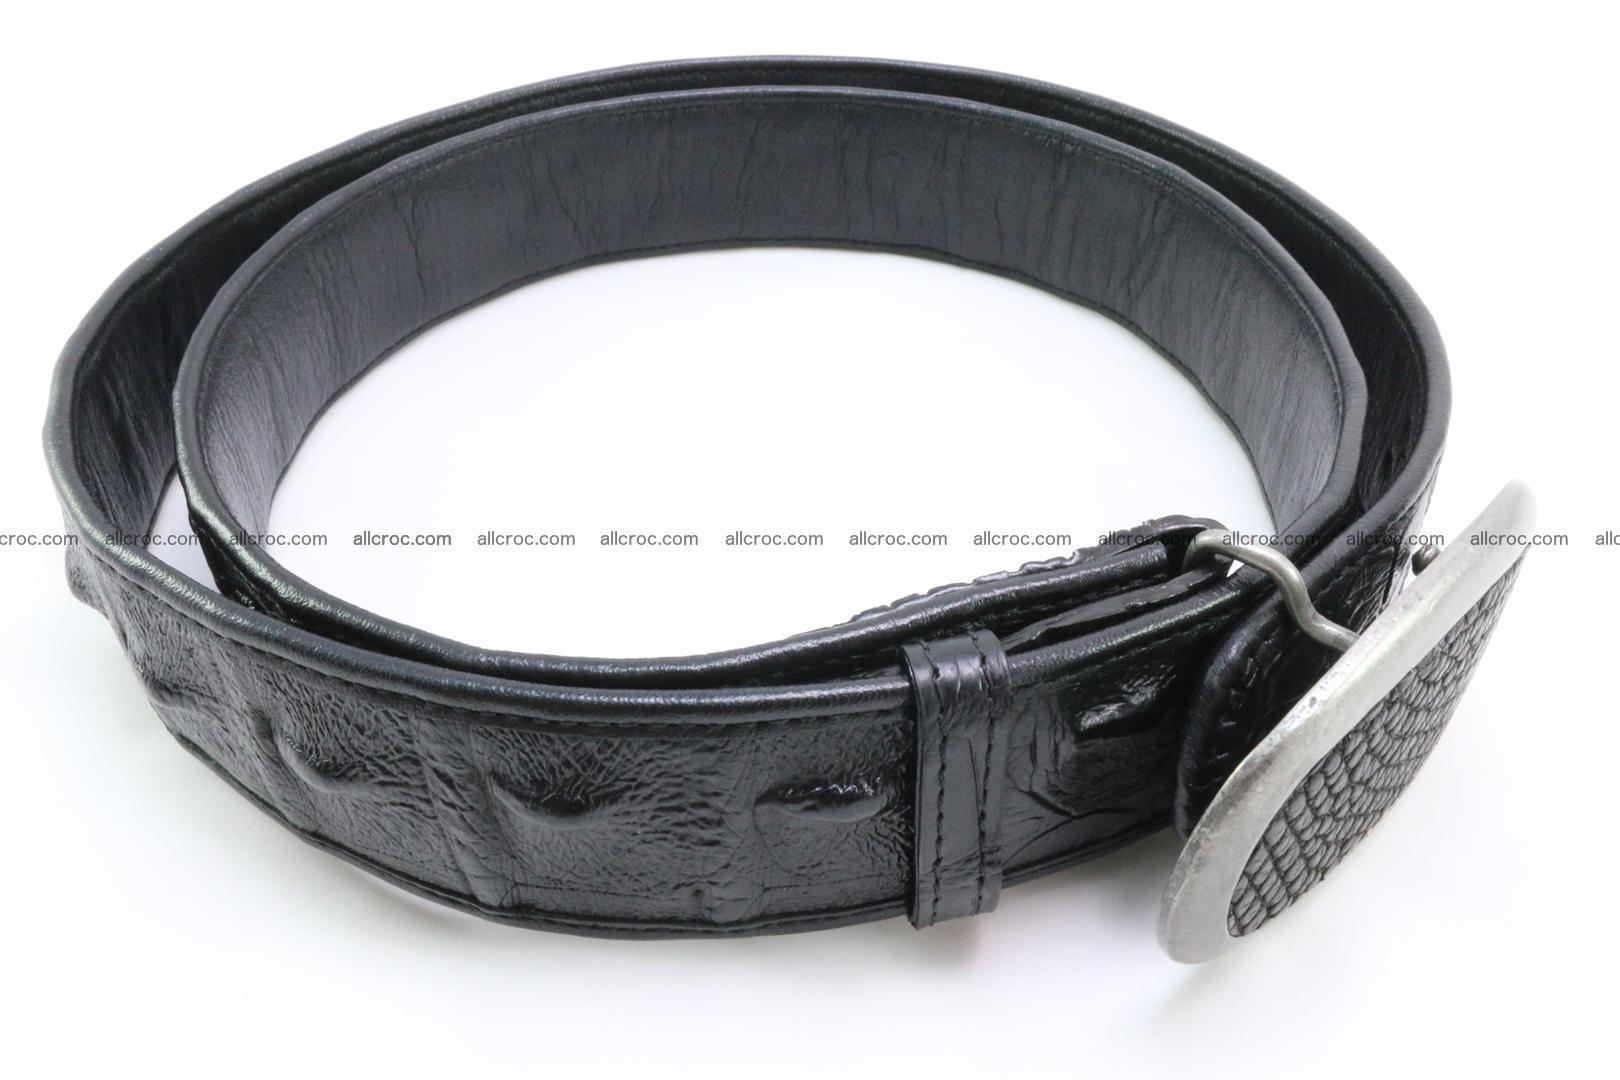 Genuine crocodile leather hornback belt 081 Foto 2